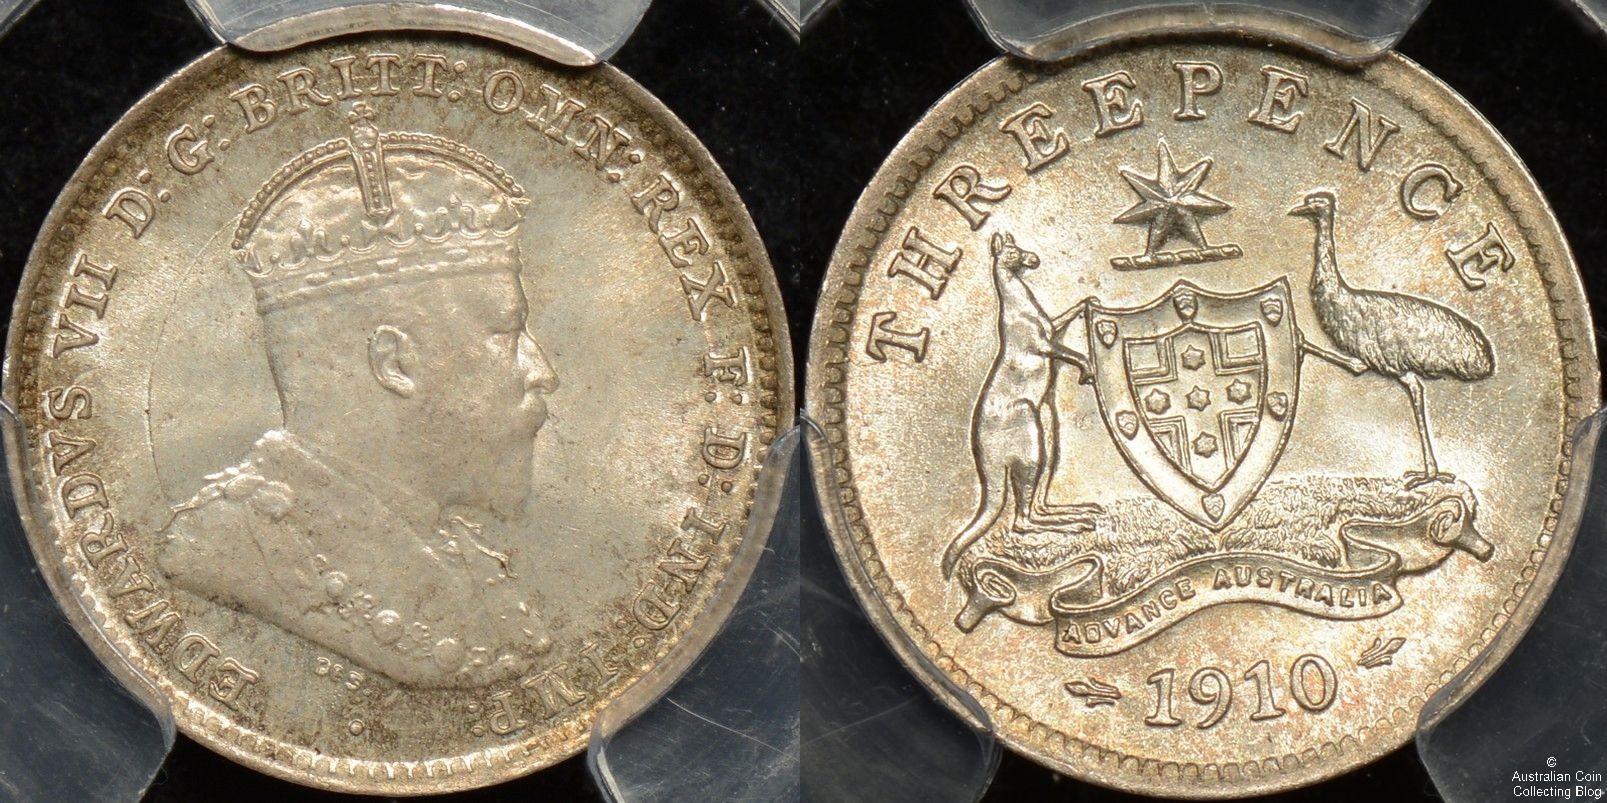 Australia 1910 Threepence PCGS MS66